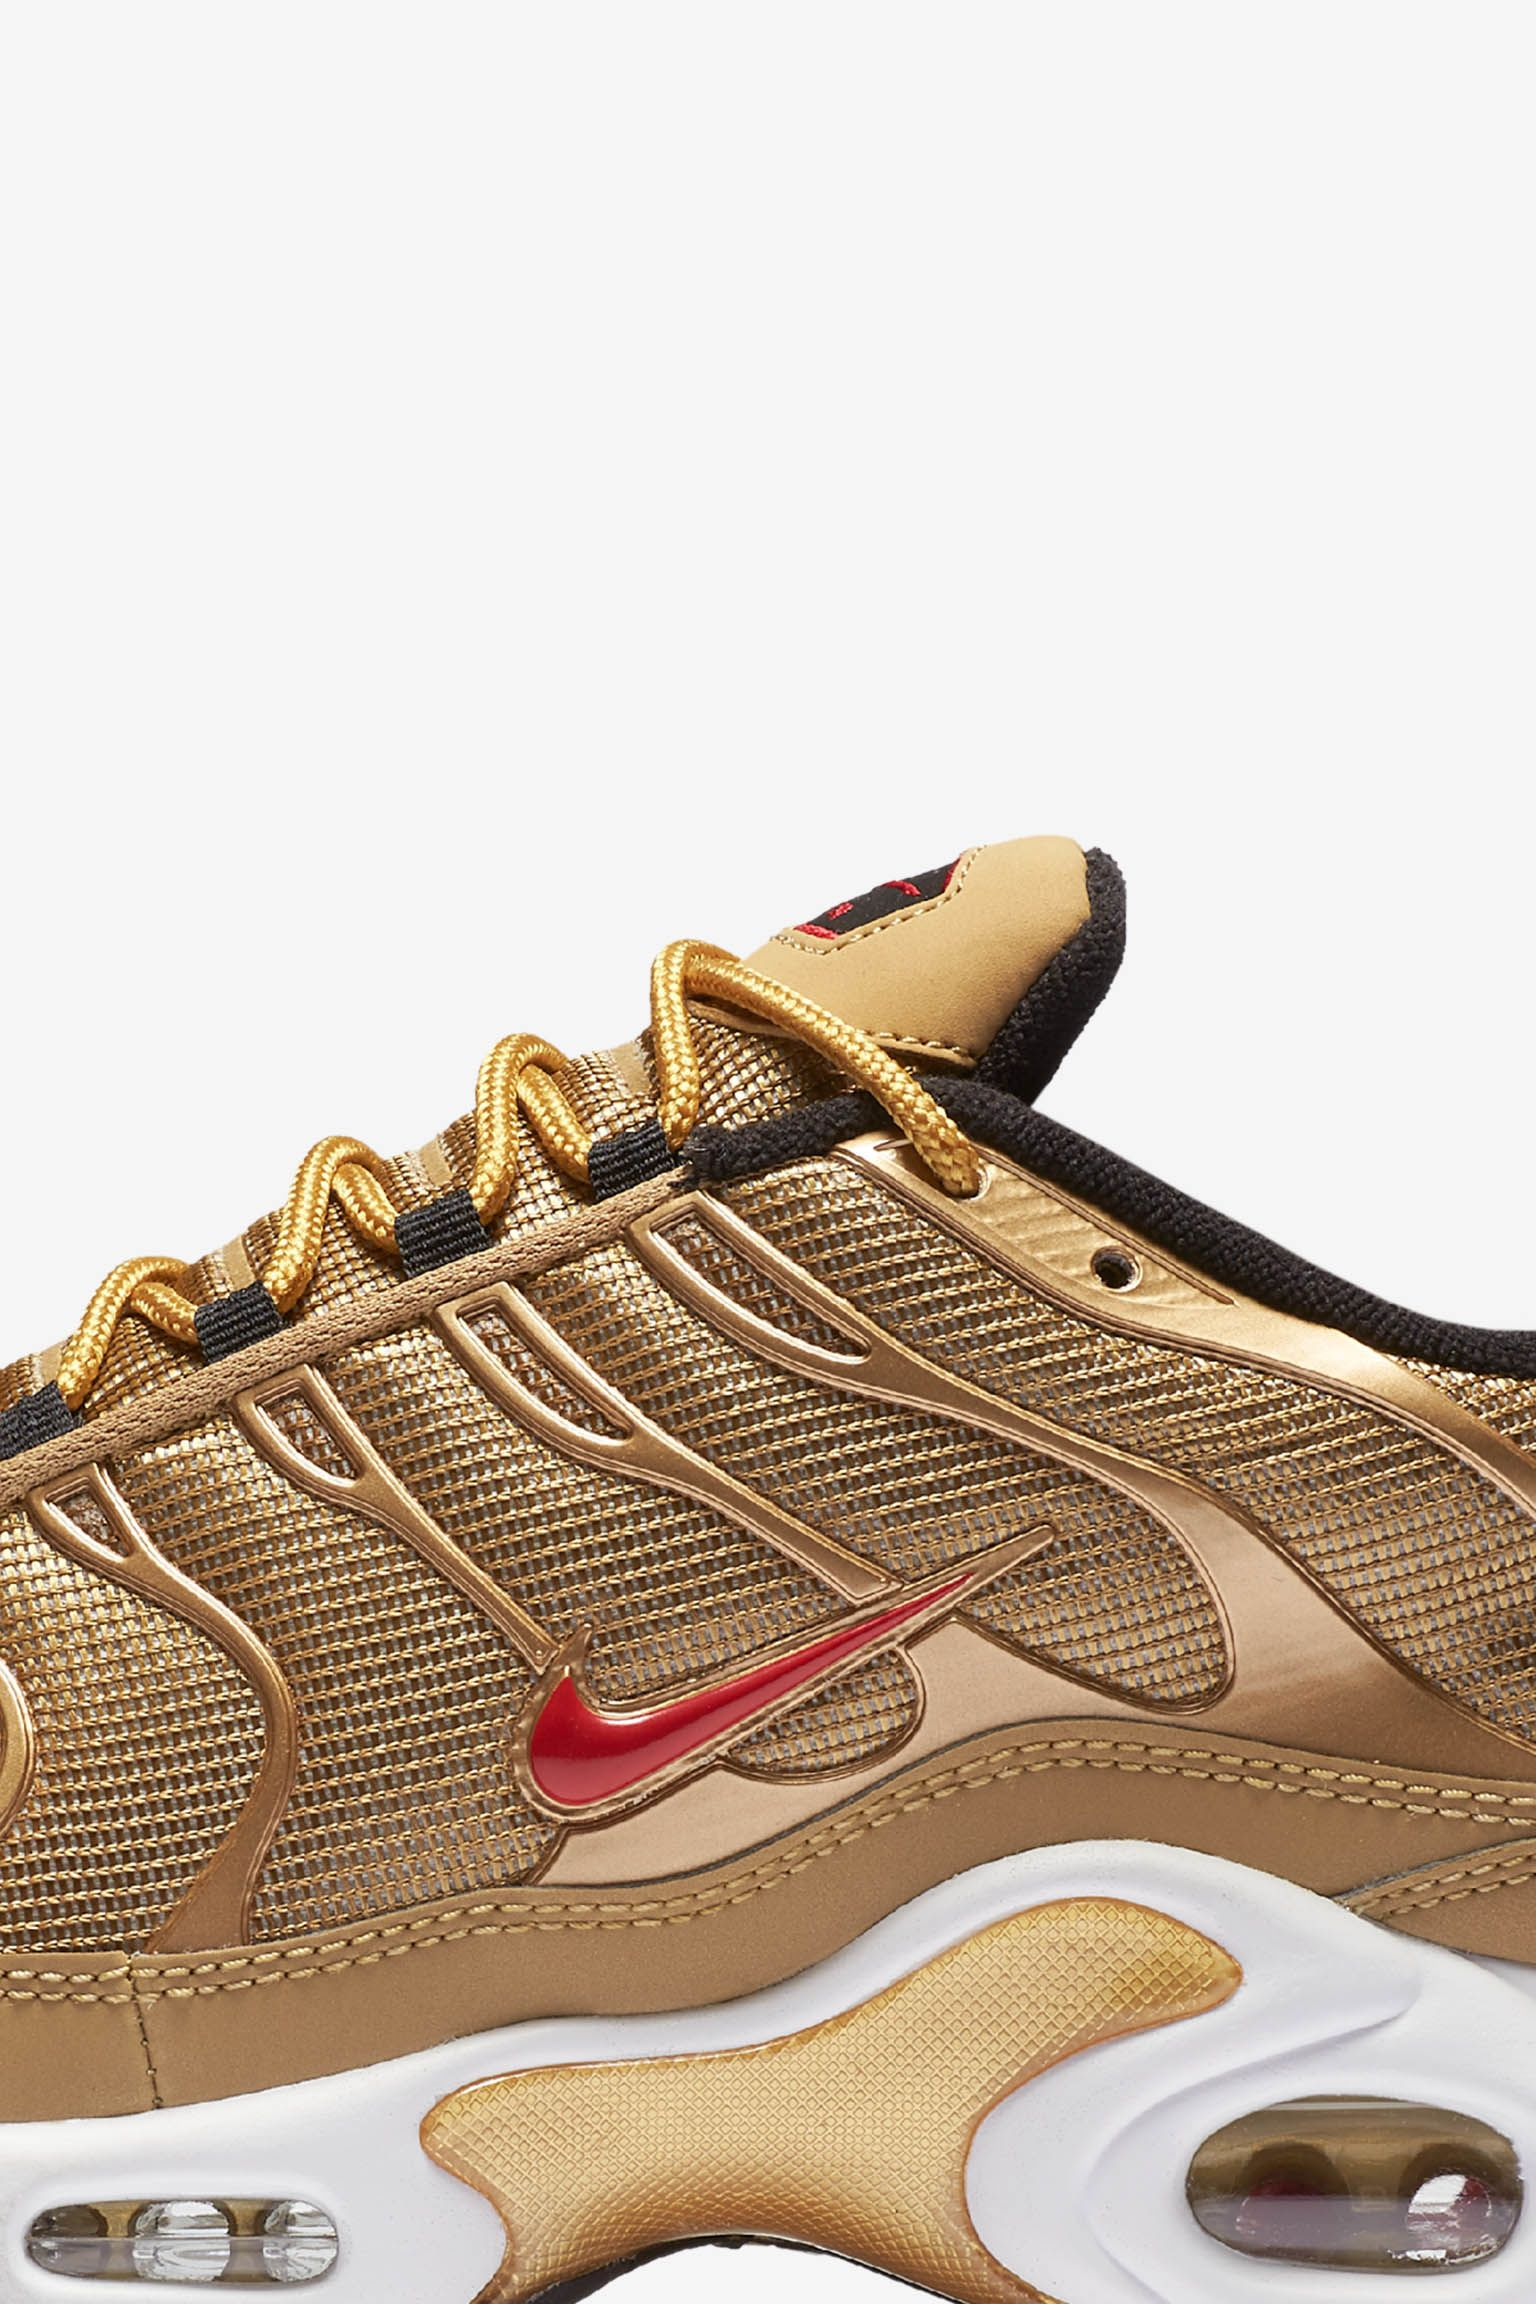 Nike Air Max Plus  Metallic Gold  Release Date. Nike+ SNKRS bb5d8f0d6a